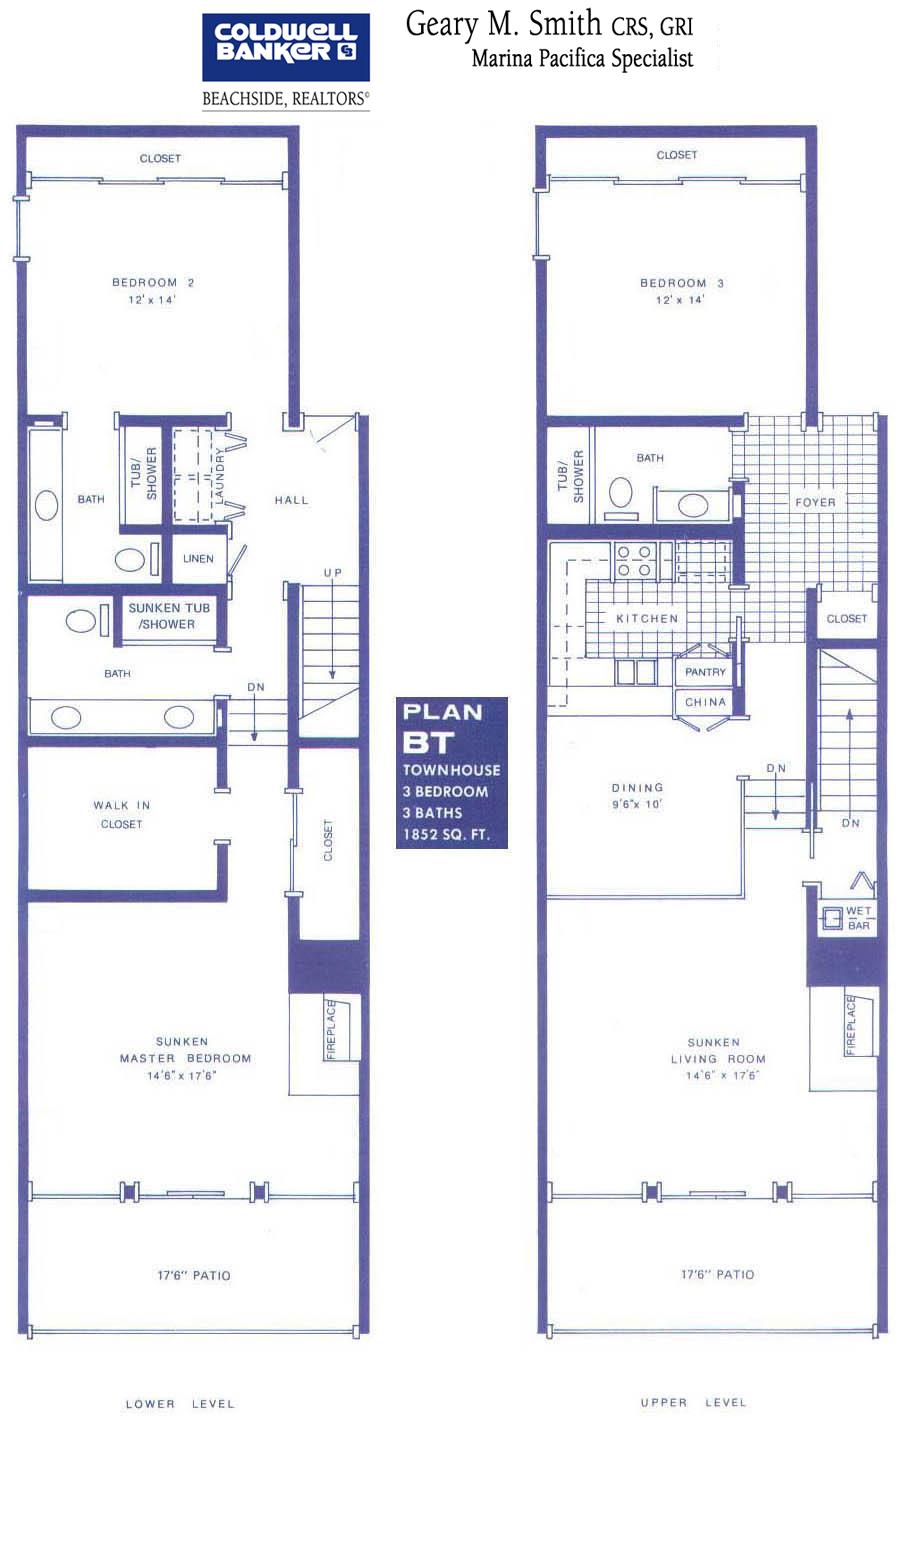 Floor Plans Marina Pacifica